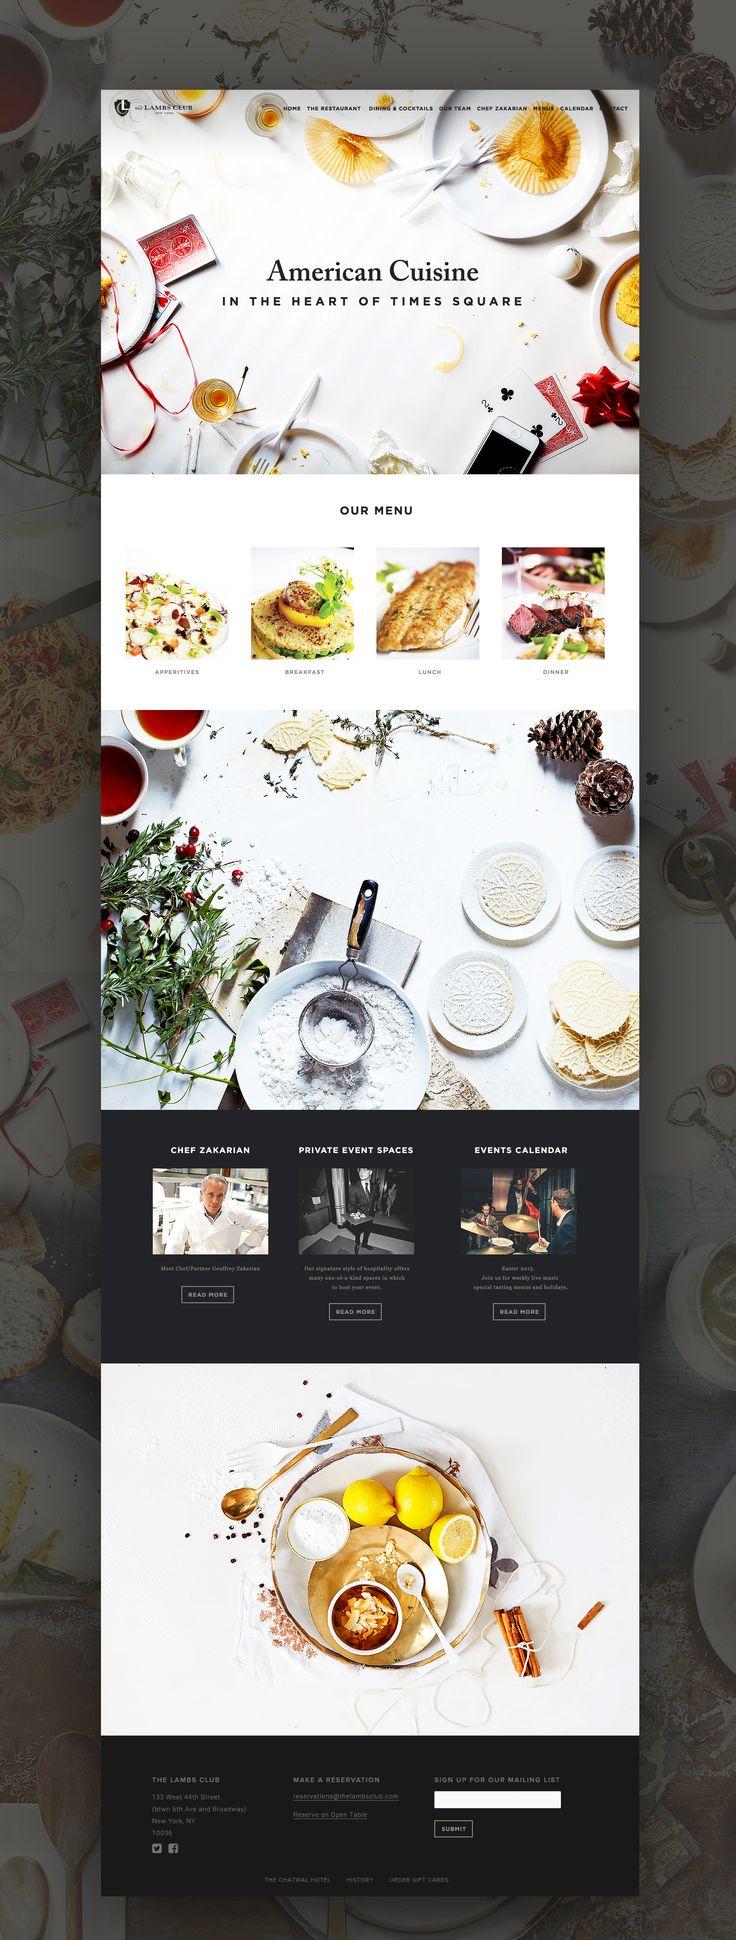 American Cuisine Website Design